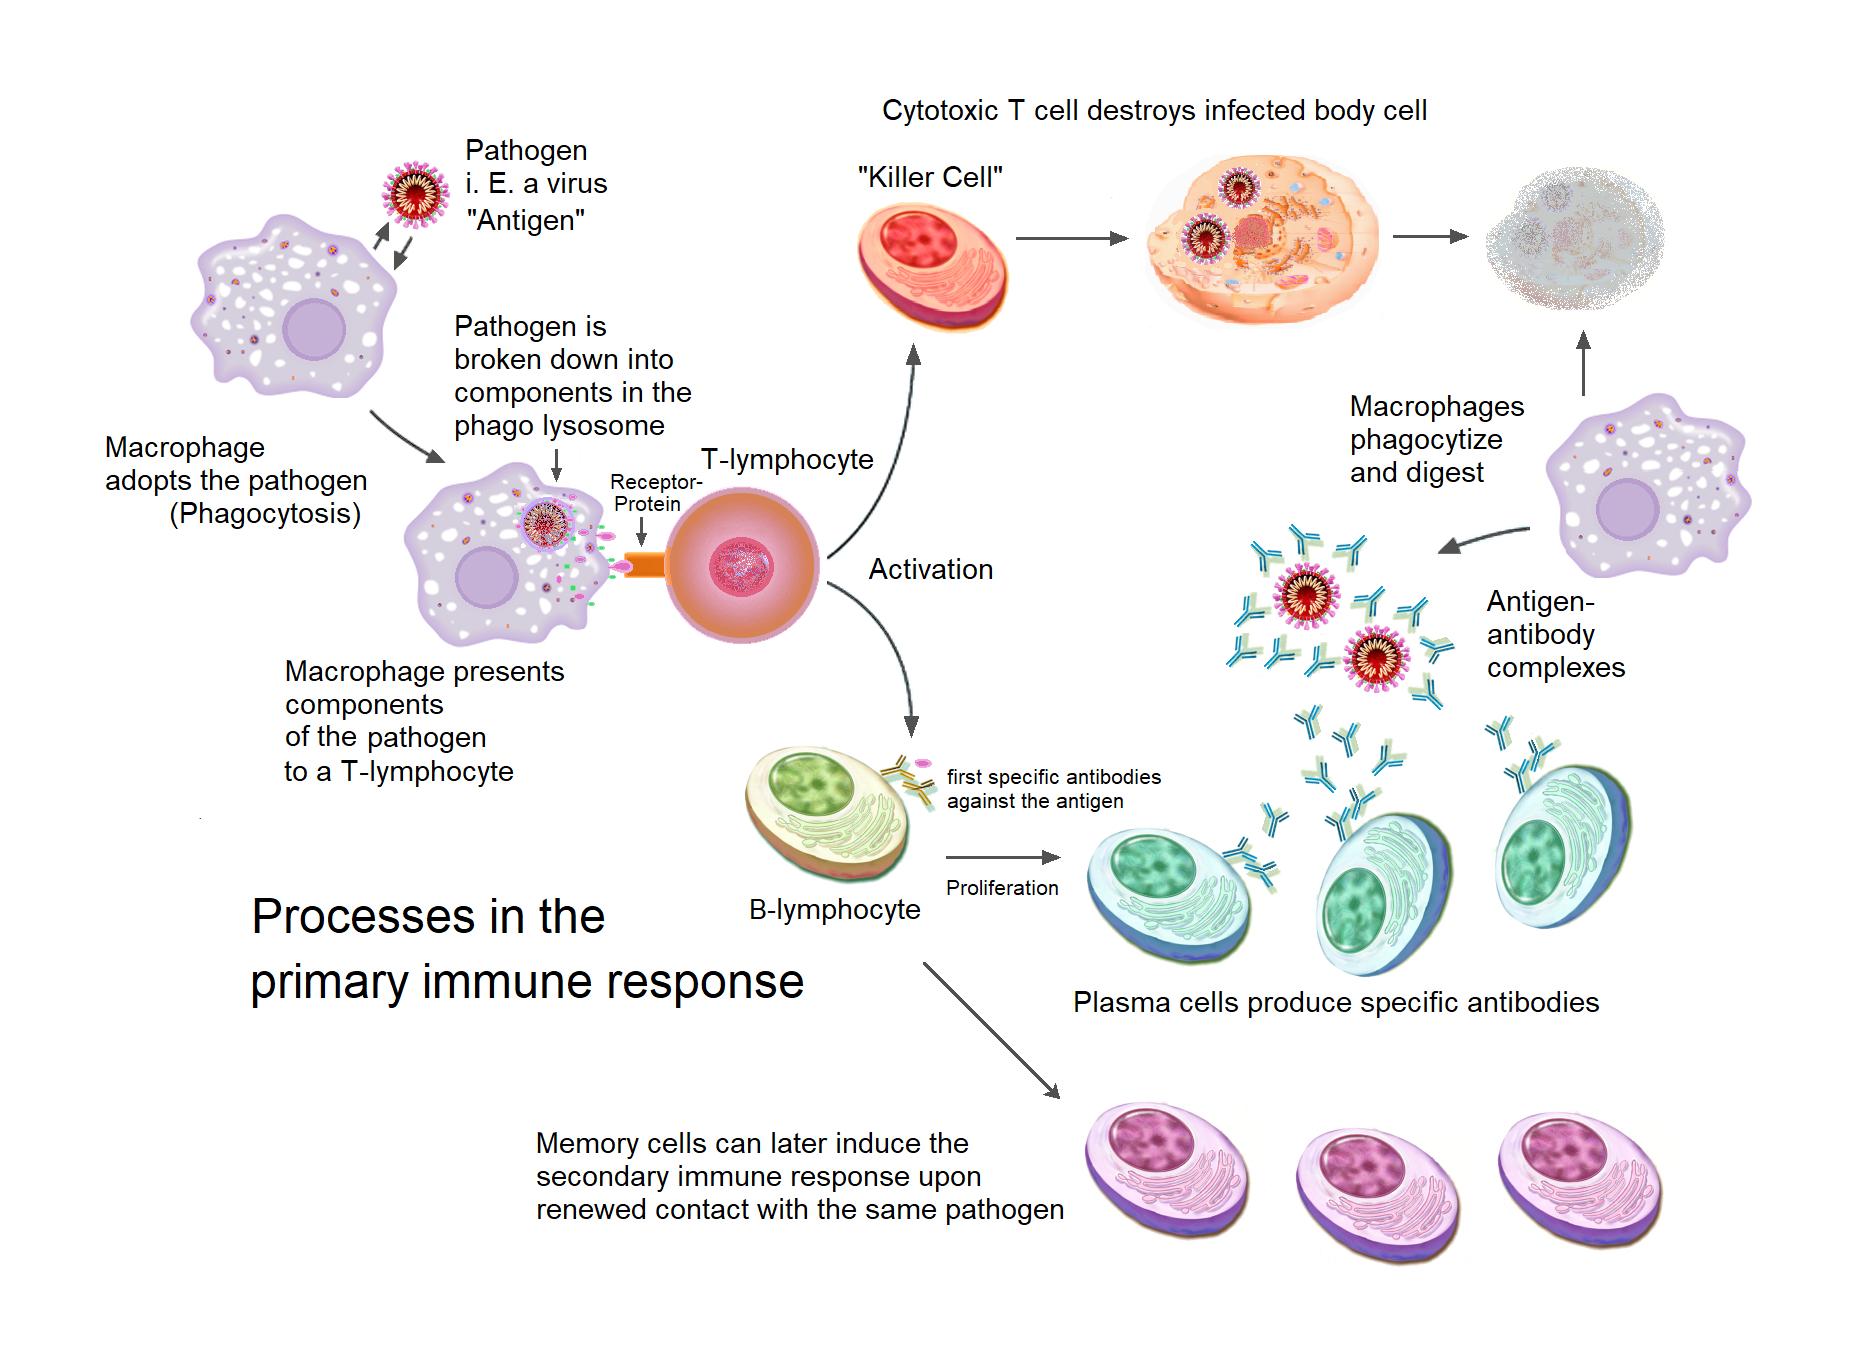 Primary Immune response